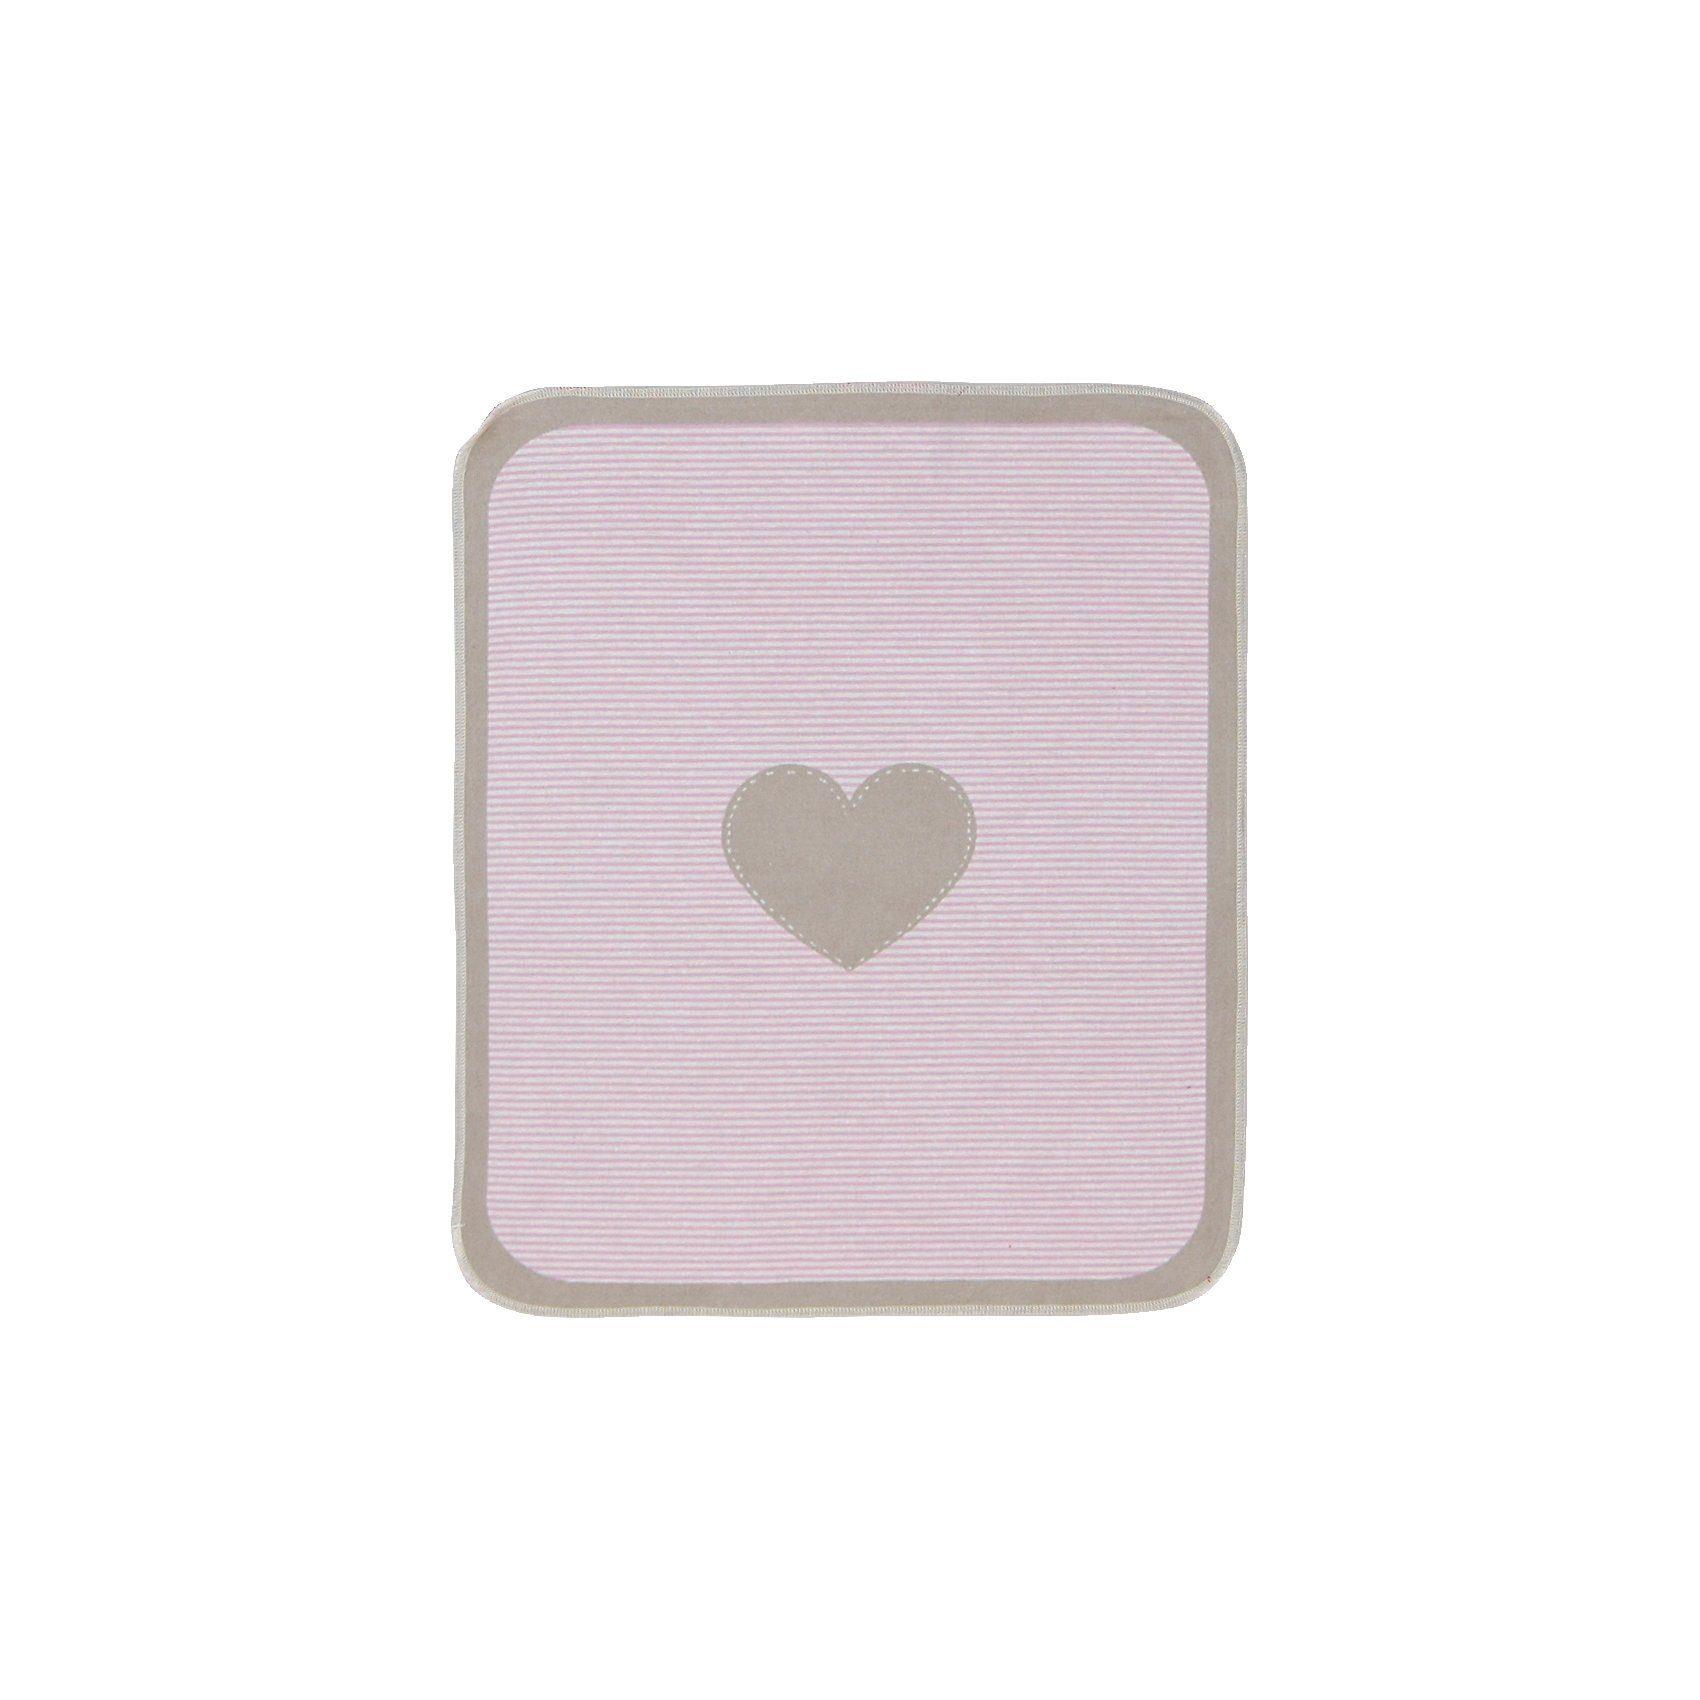 David Fussenegger Babydecke Juwel Herzchen, pink, 70 x 90 cm